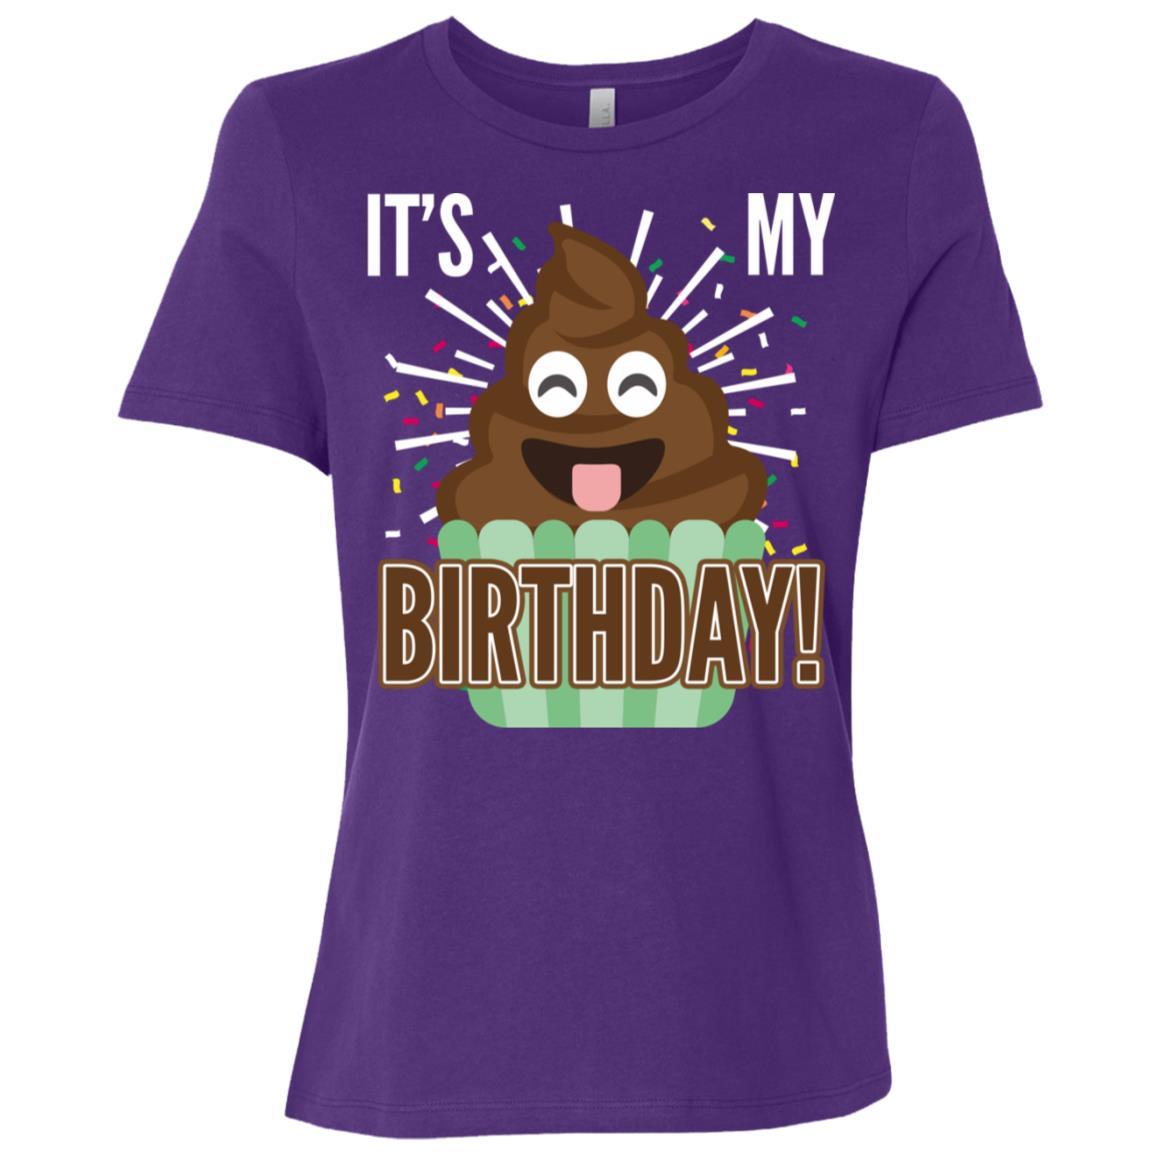 It's My Birthday Funny Smile Stink Cupcake Gift Women Short Sleeve T-Shirt